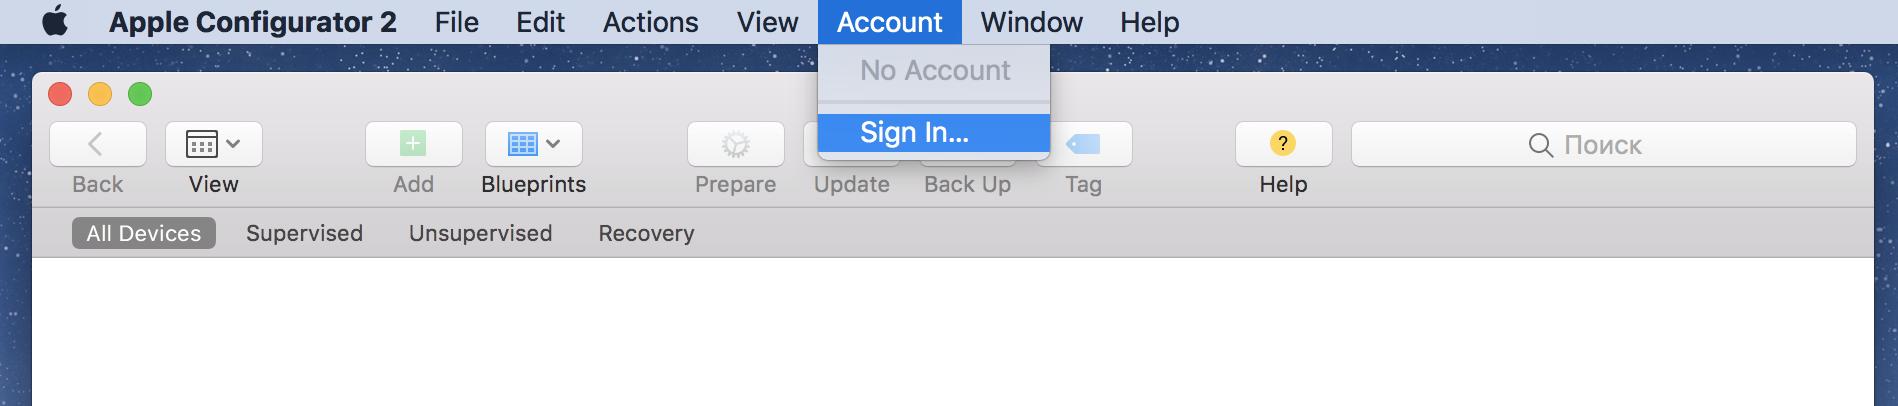 Как установить ipa файл на iphone/ipad/ipod (ios/winodws.